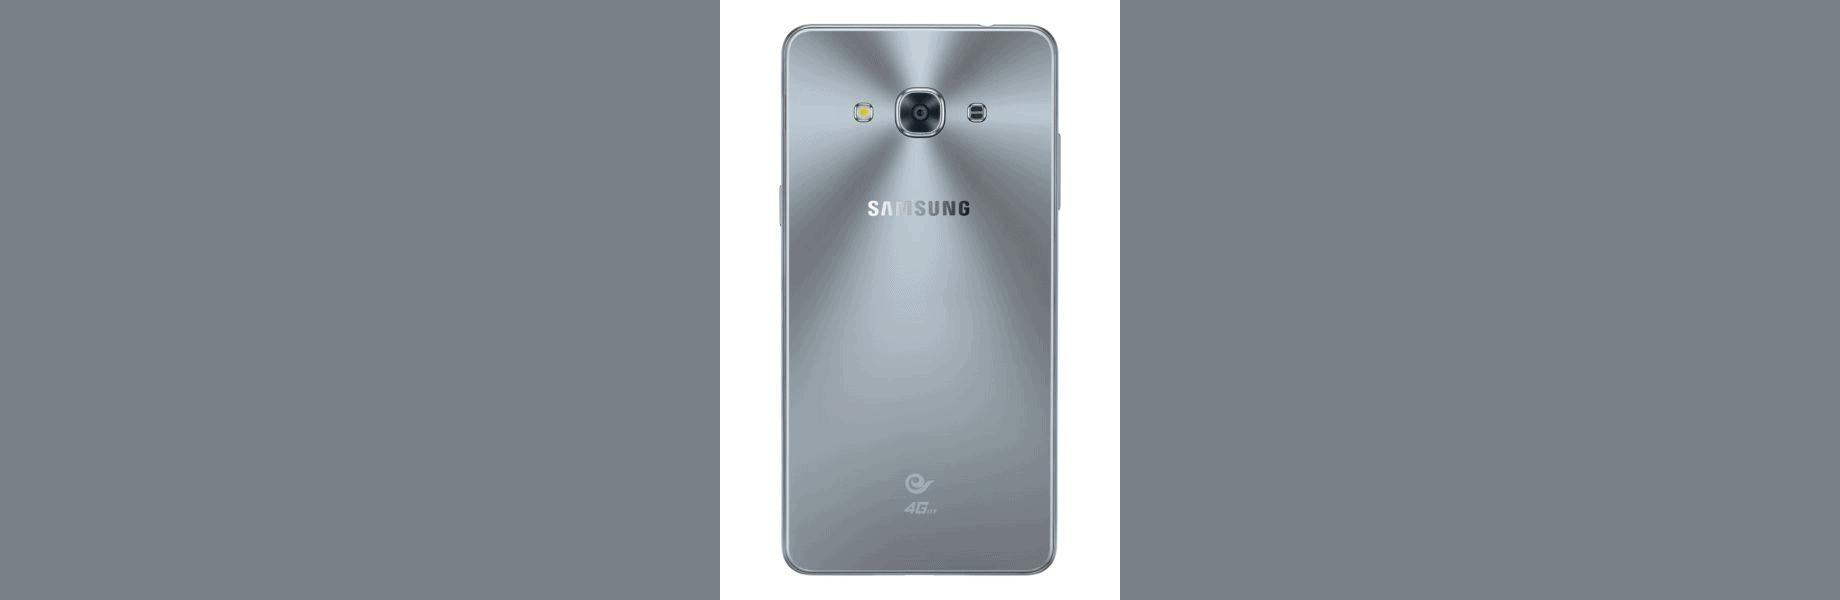 Samsung Galaxy J3 Pro 7